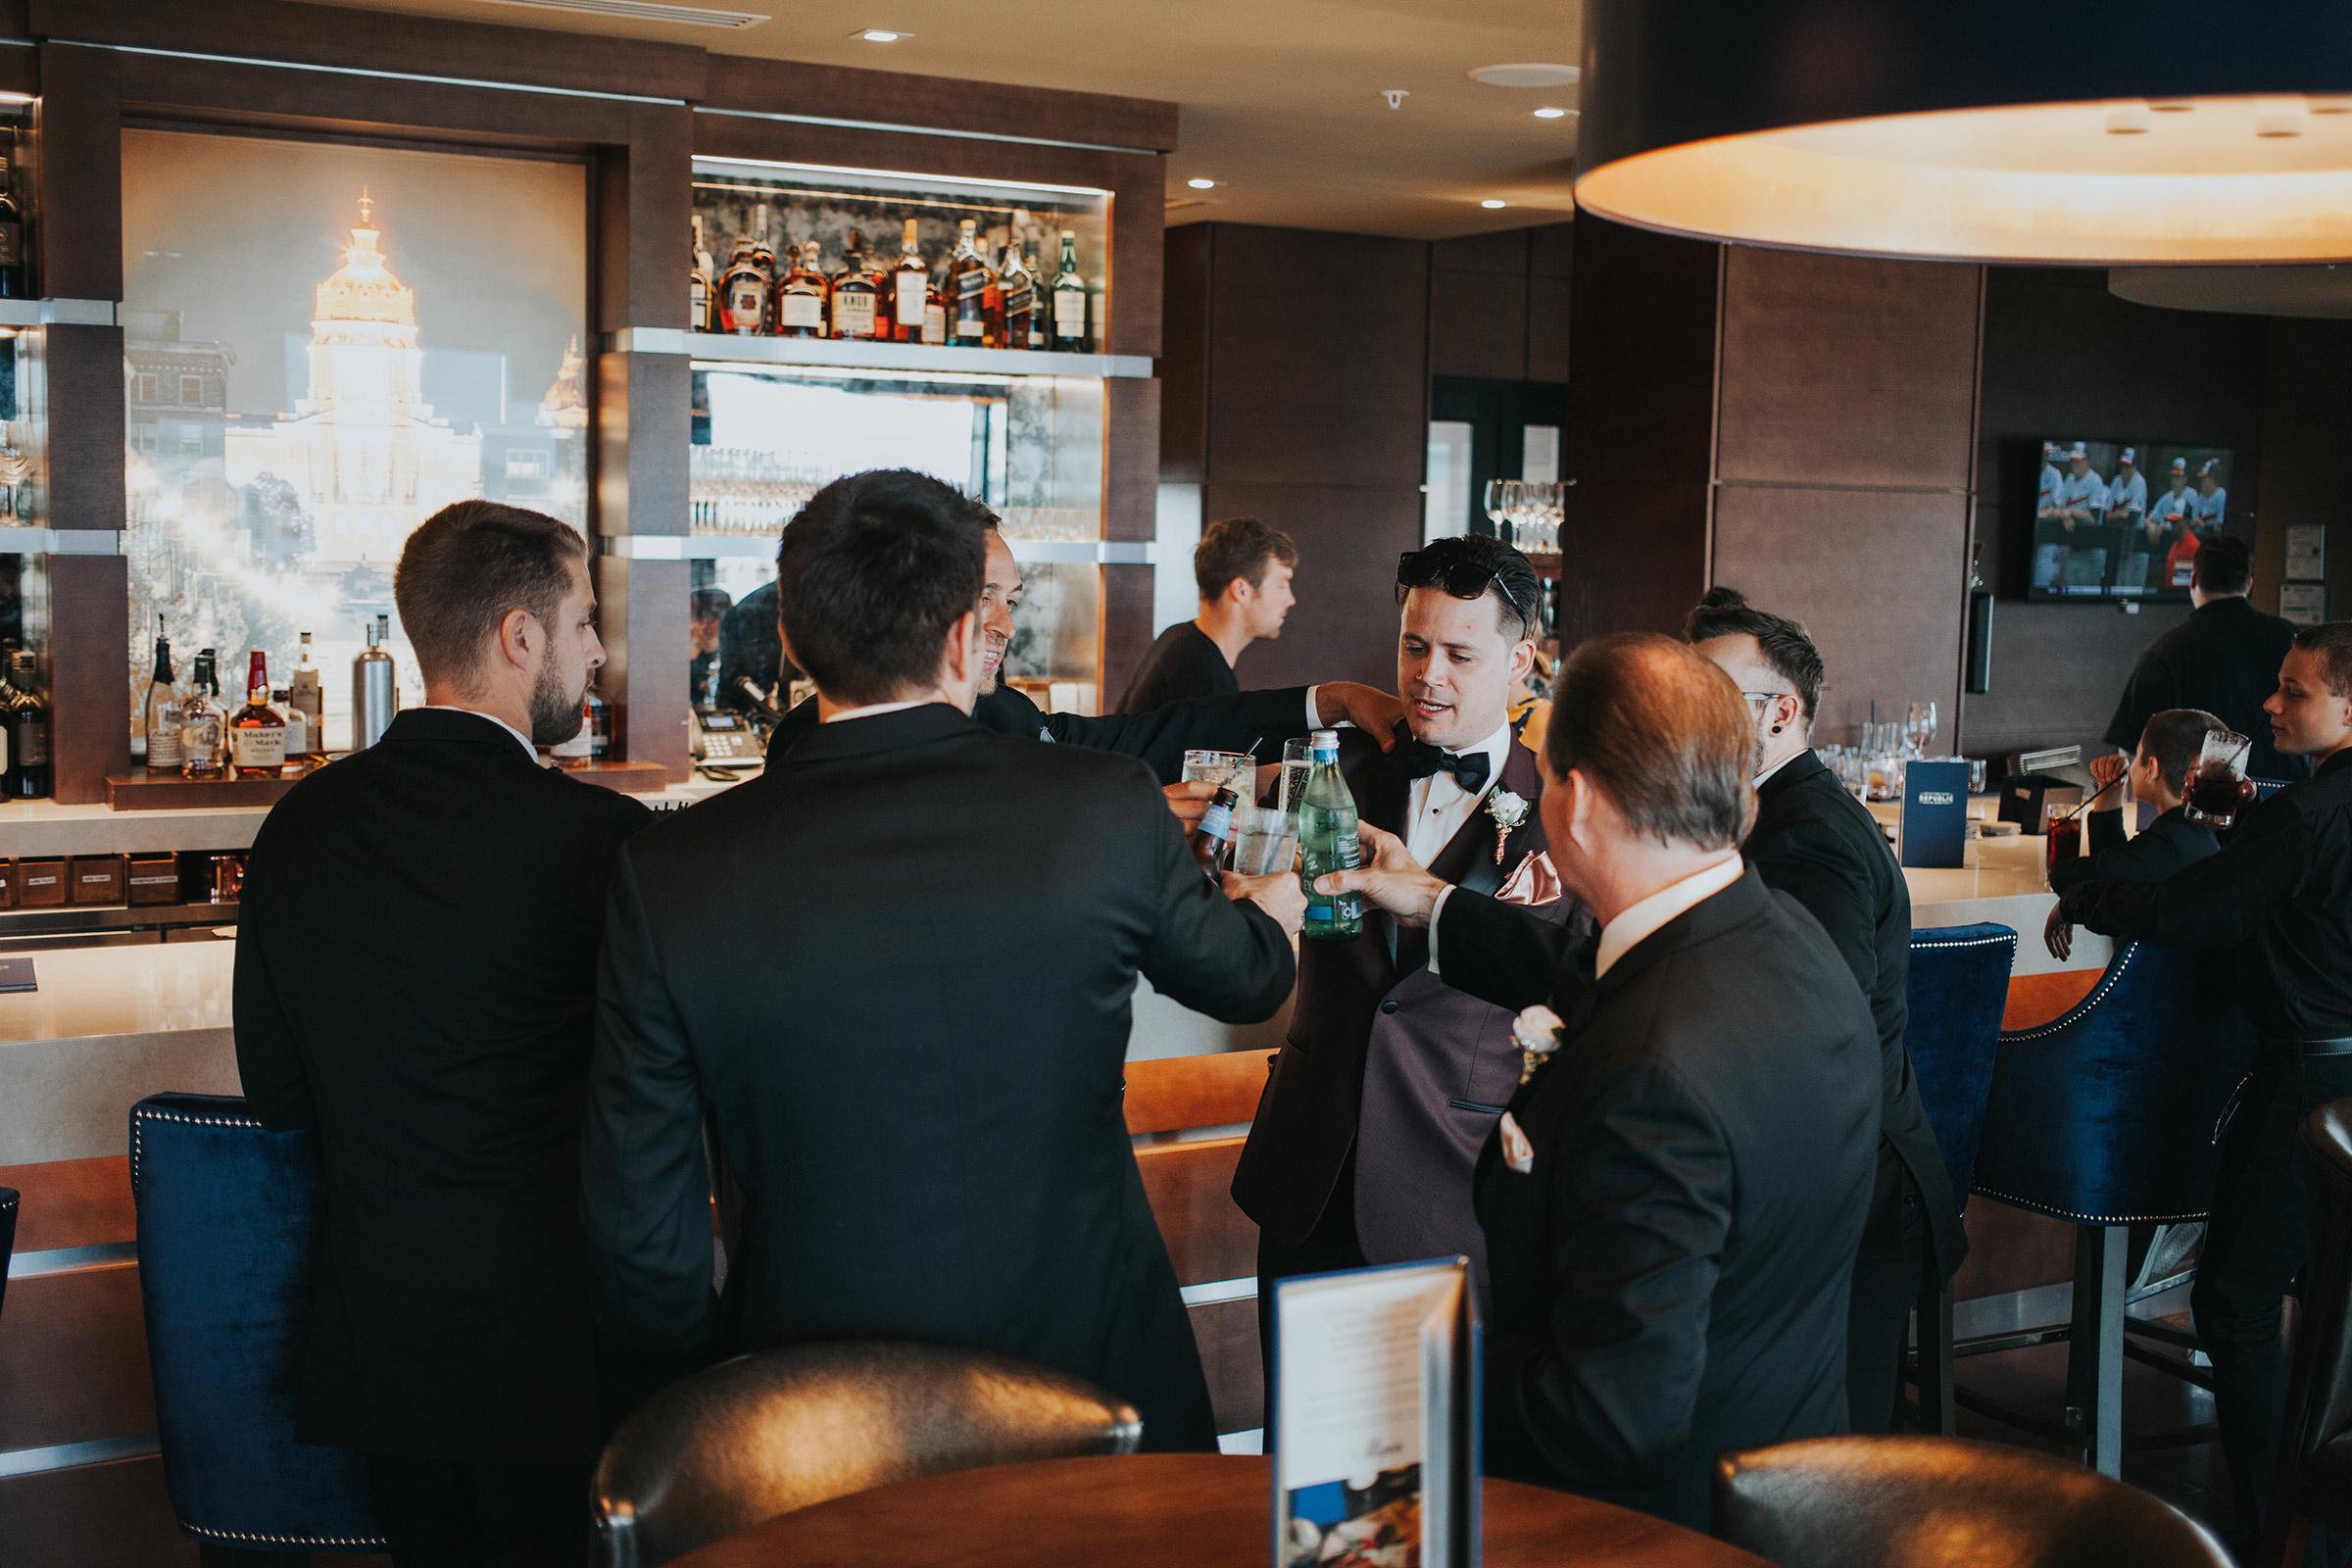 groomsmen-cheers-republic-on-grand-desmoines-iowa-ac-hotel-raelyn-ramey-photography.jpg